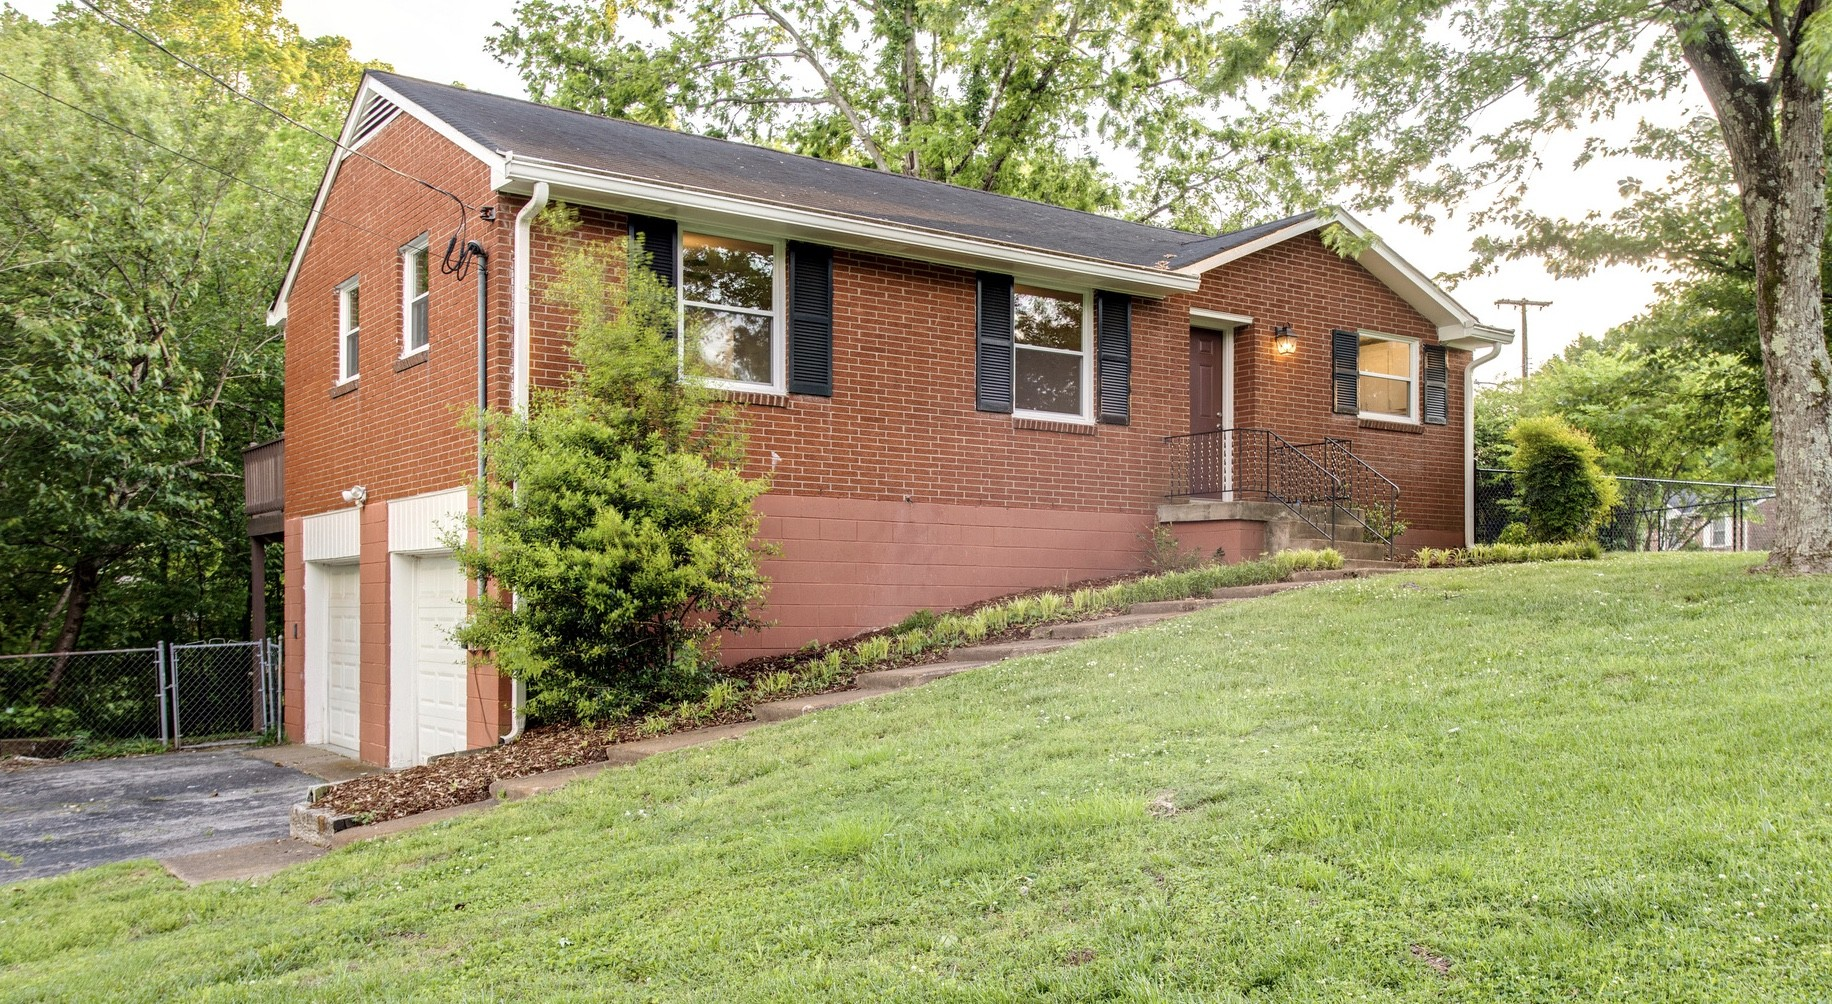 3801 Bunny Dr Property Photo - Nashville, TN real estate listing